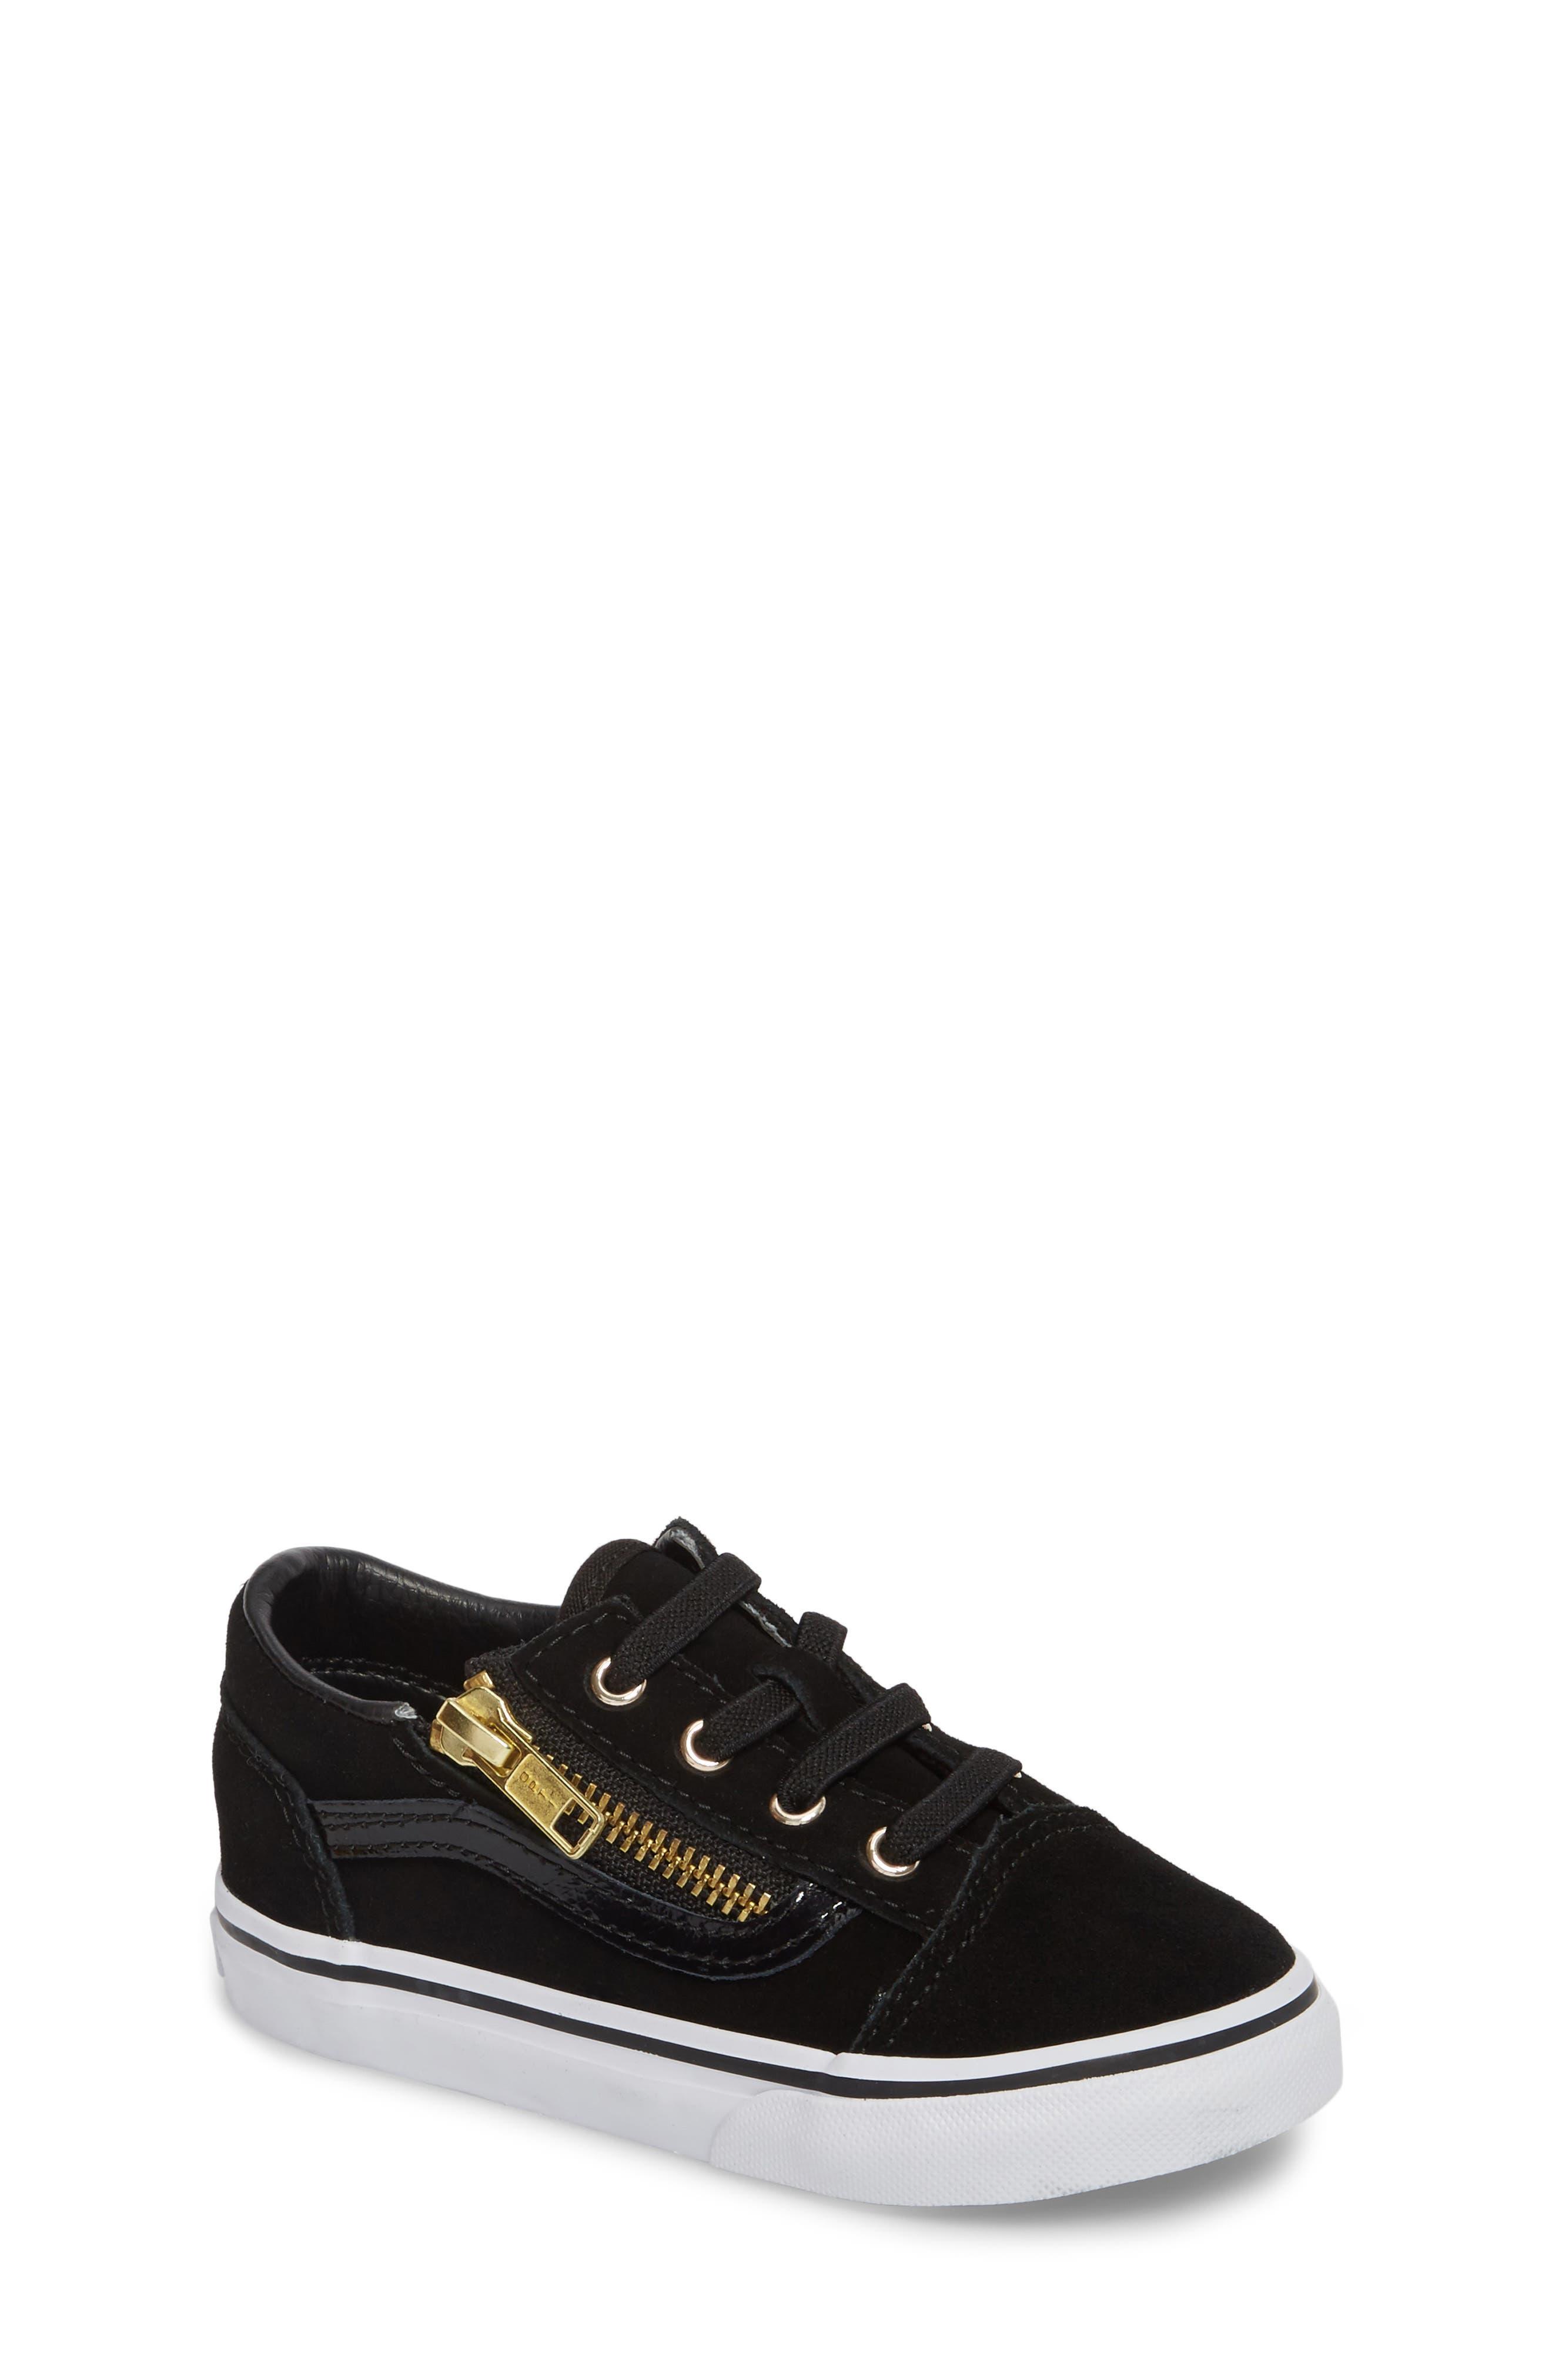 Old Skool Zip Sneaker,                         Main,                         color, Black/ Gold